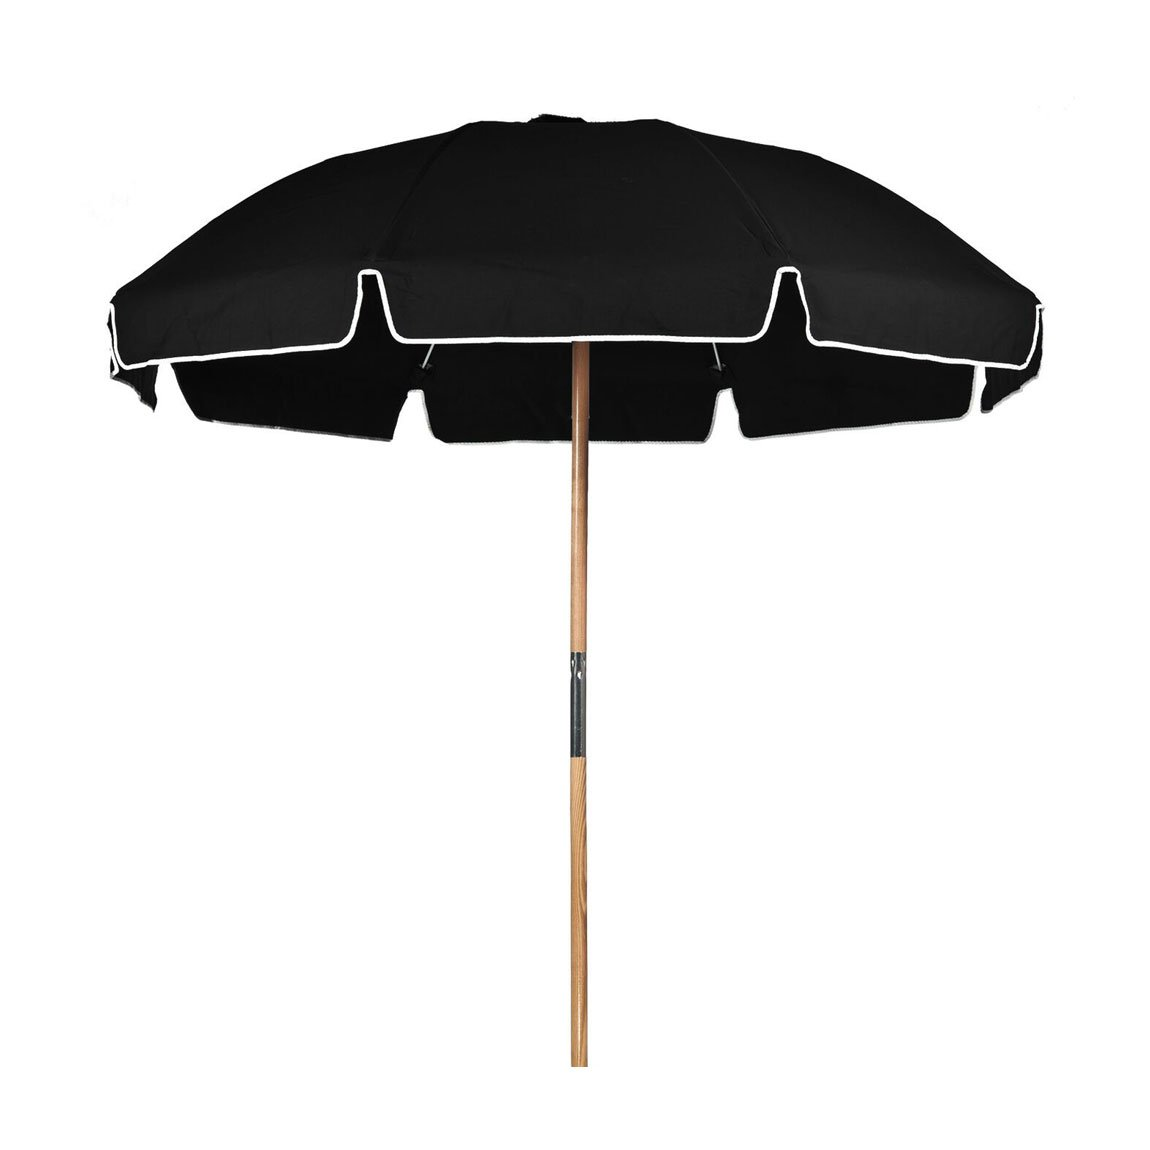 7.5 ft. Avalon Fiberglass Heavy Duty Commercial Grade Beach Umbrella with Ash Wood Pole & Acrylic Fabric